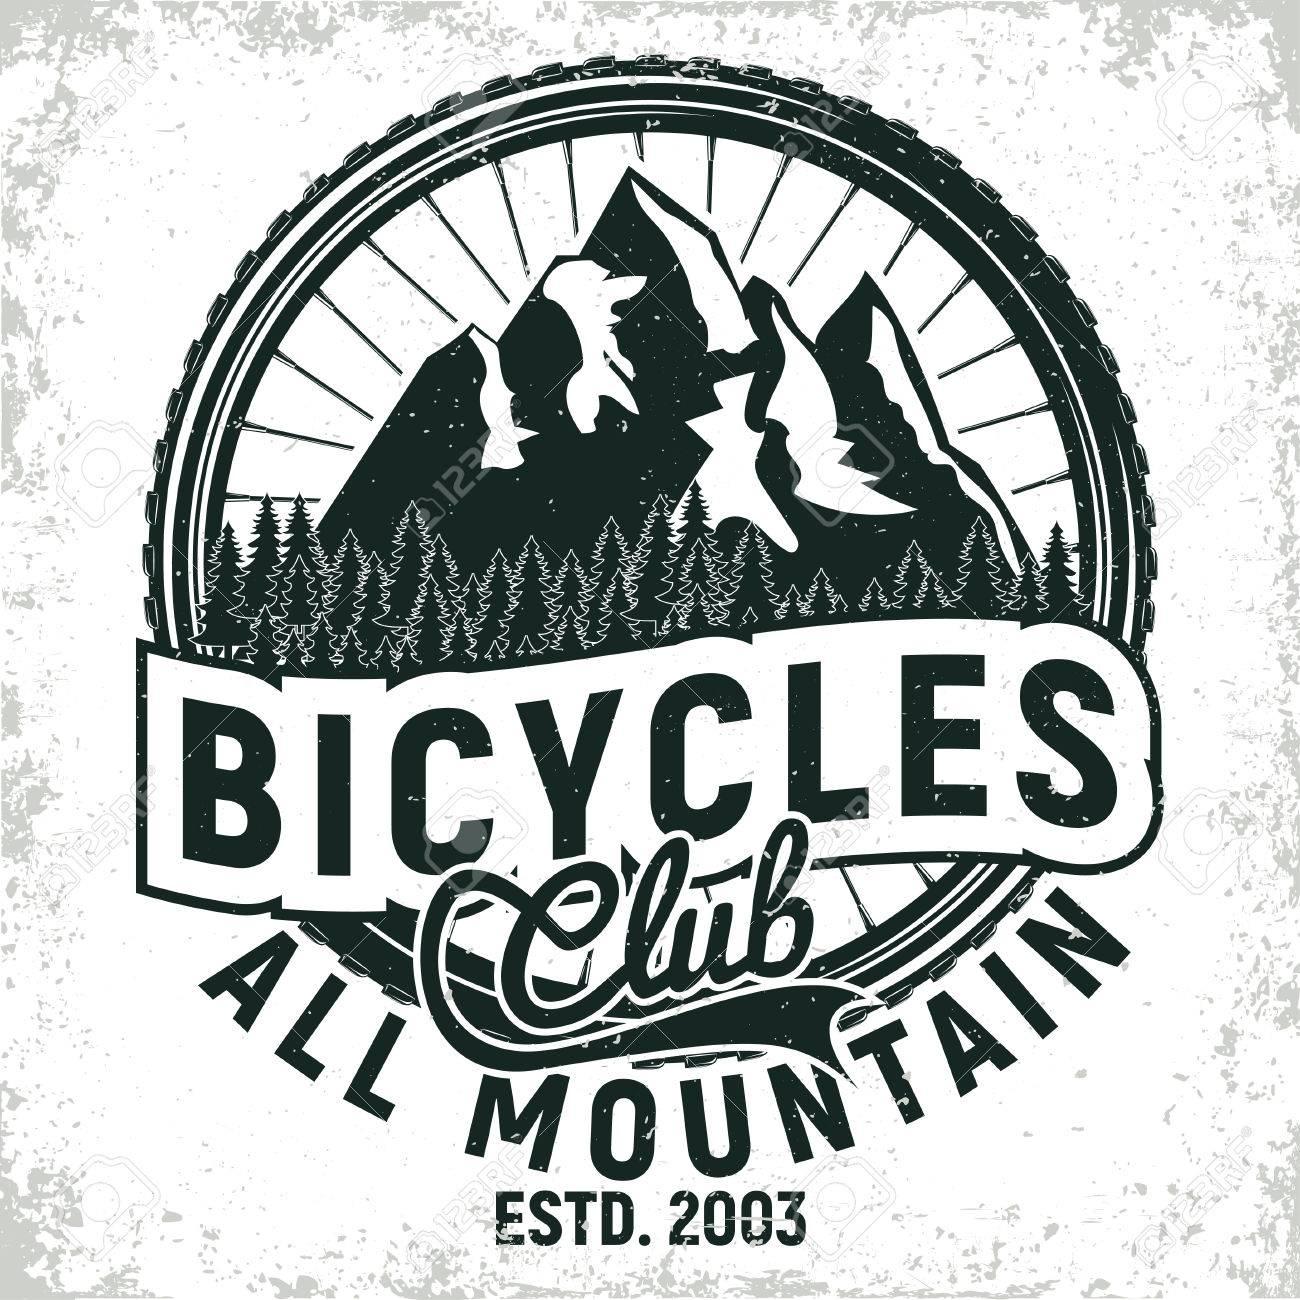 Vintage bicycles club logo design, all-mountain bikers grange print stamp, creative typography emblem, Vector - 80103278